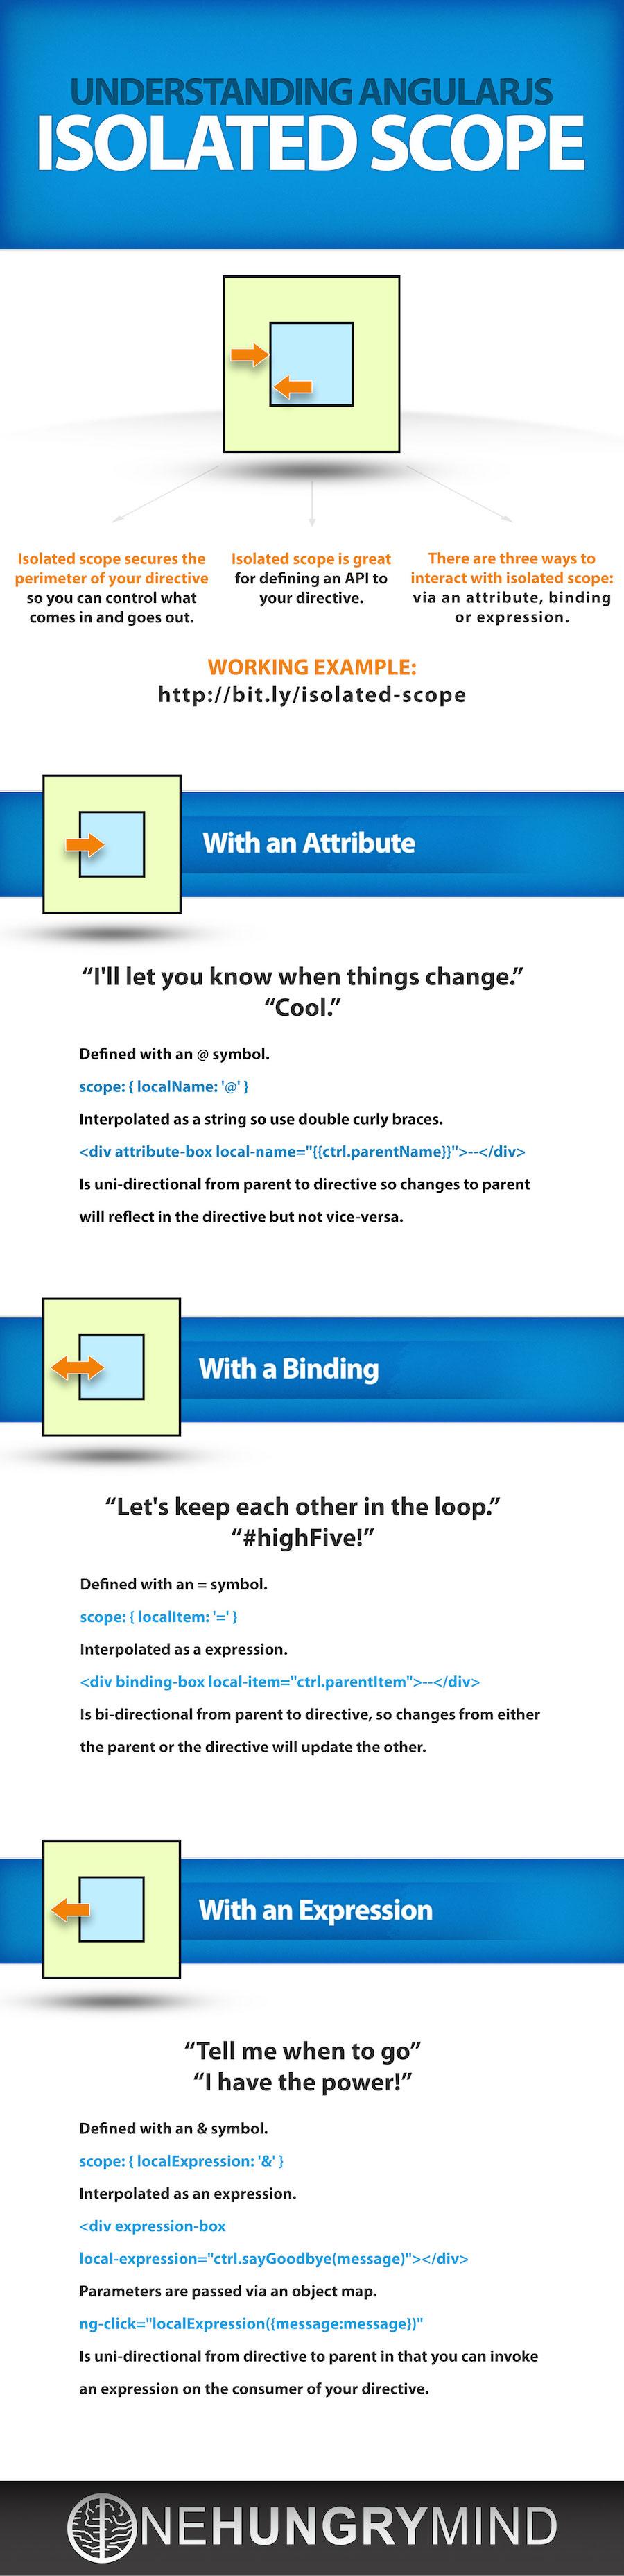 Infographic: Understanding AngularJS Isolated Scope